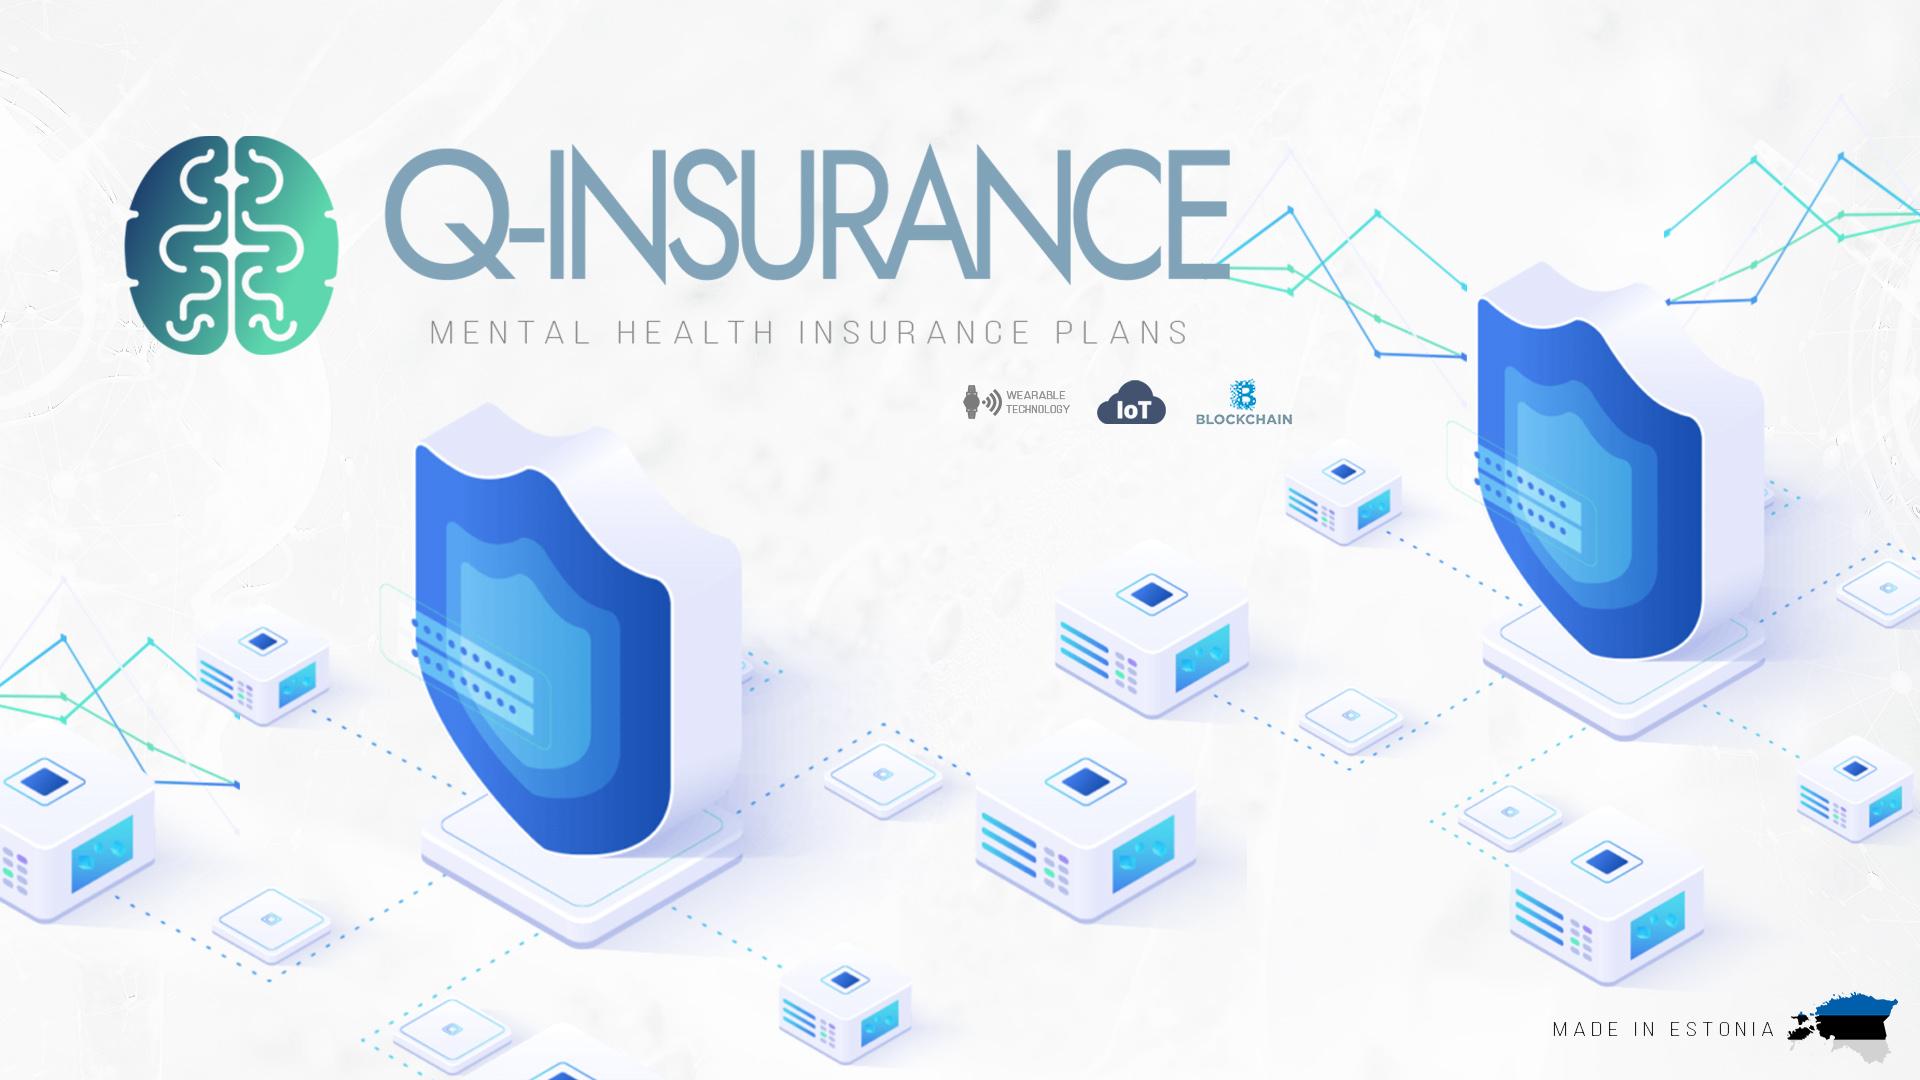 Q-Insurance banner image